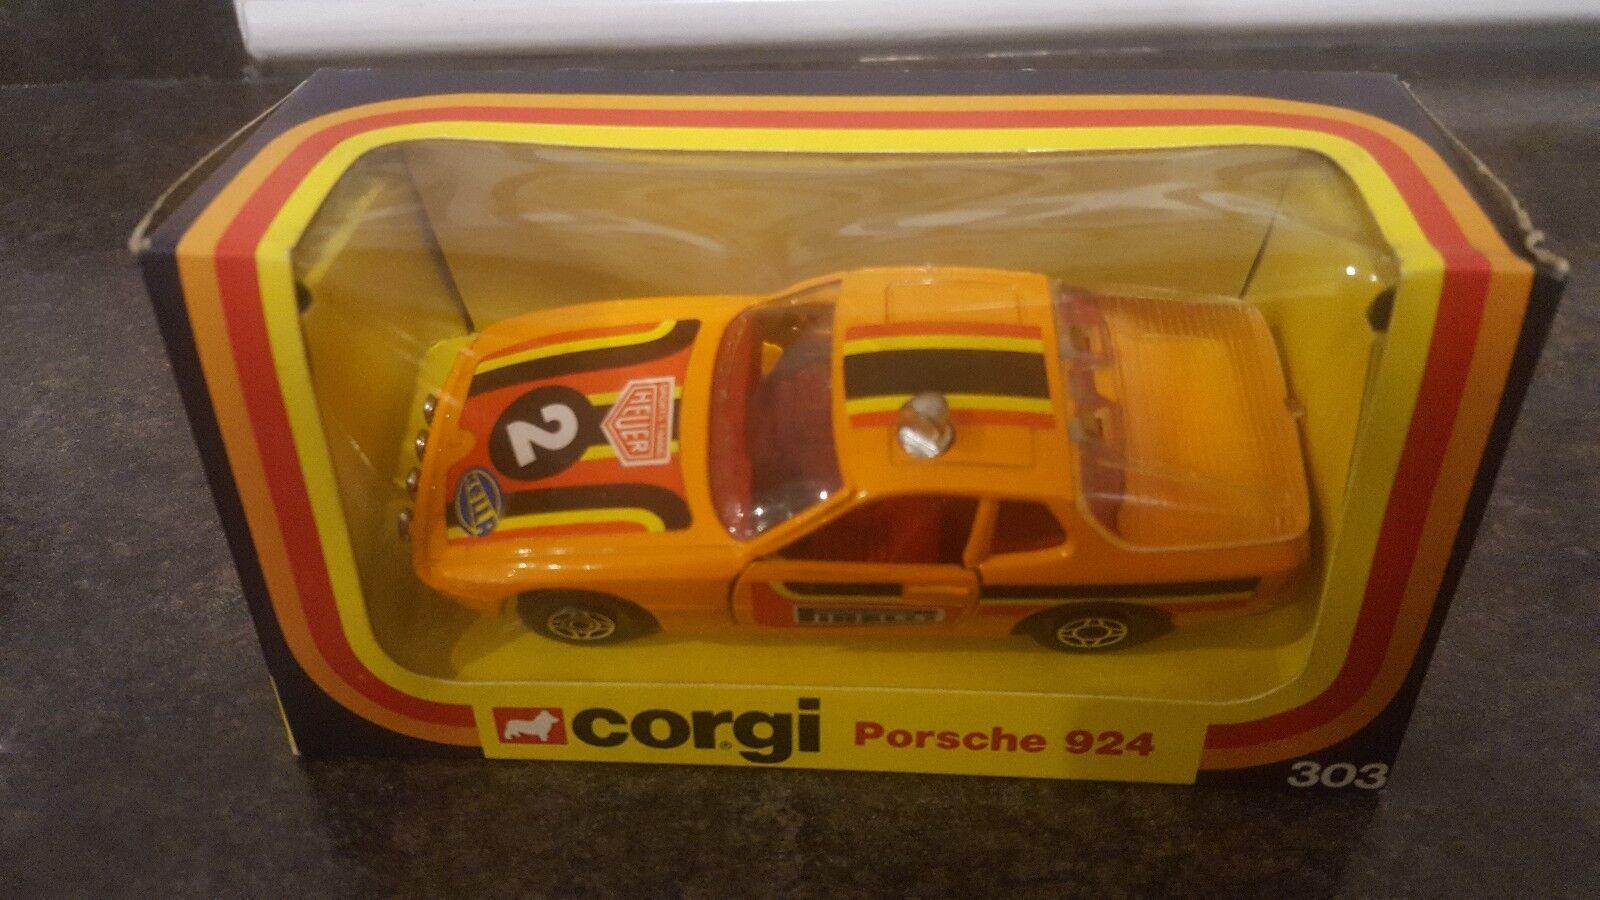 Corgi Appx 1 36 Scale Diecast 303 - Porsche 924 - orange